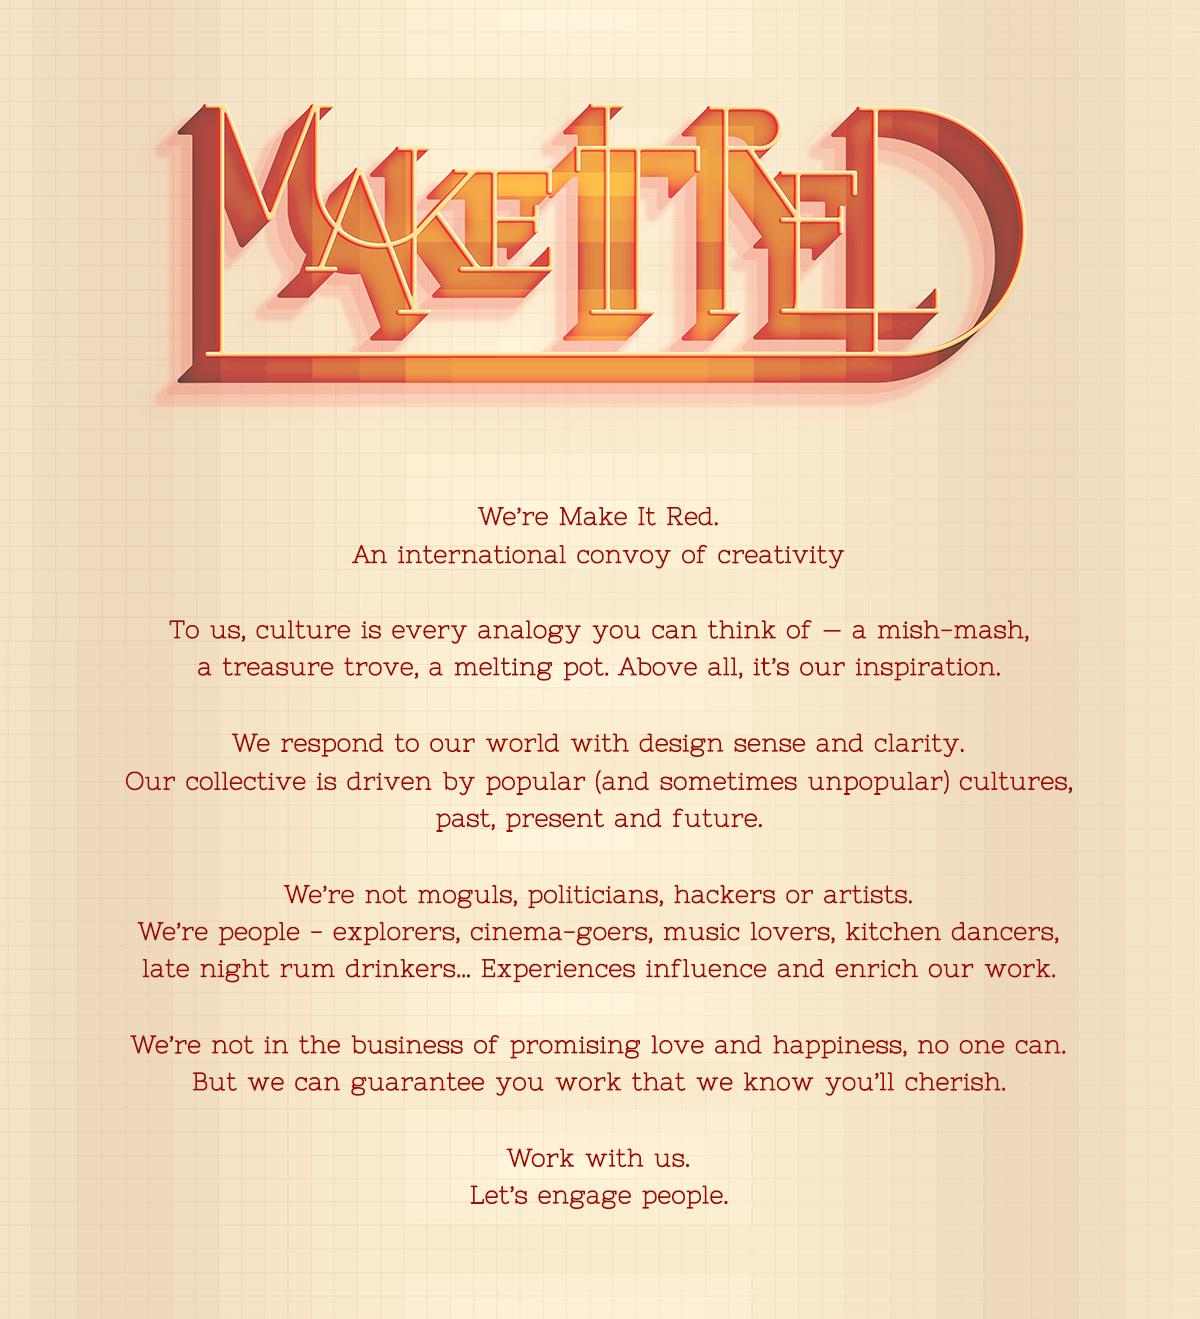 Make It Red manifesto